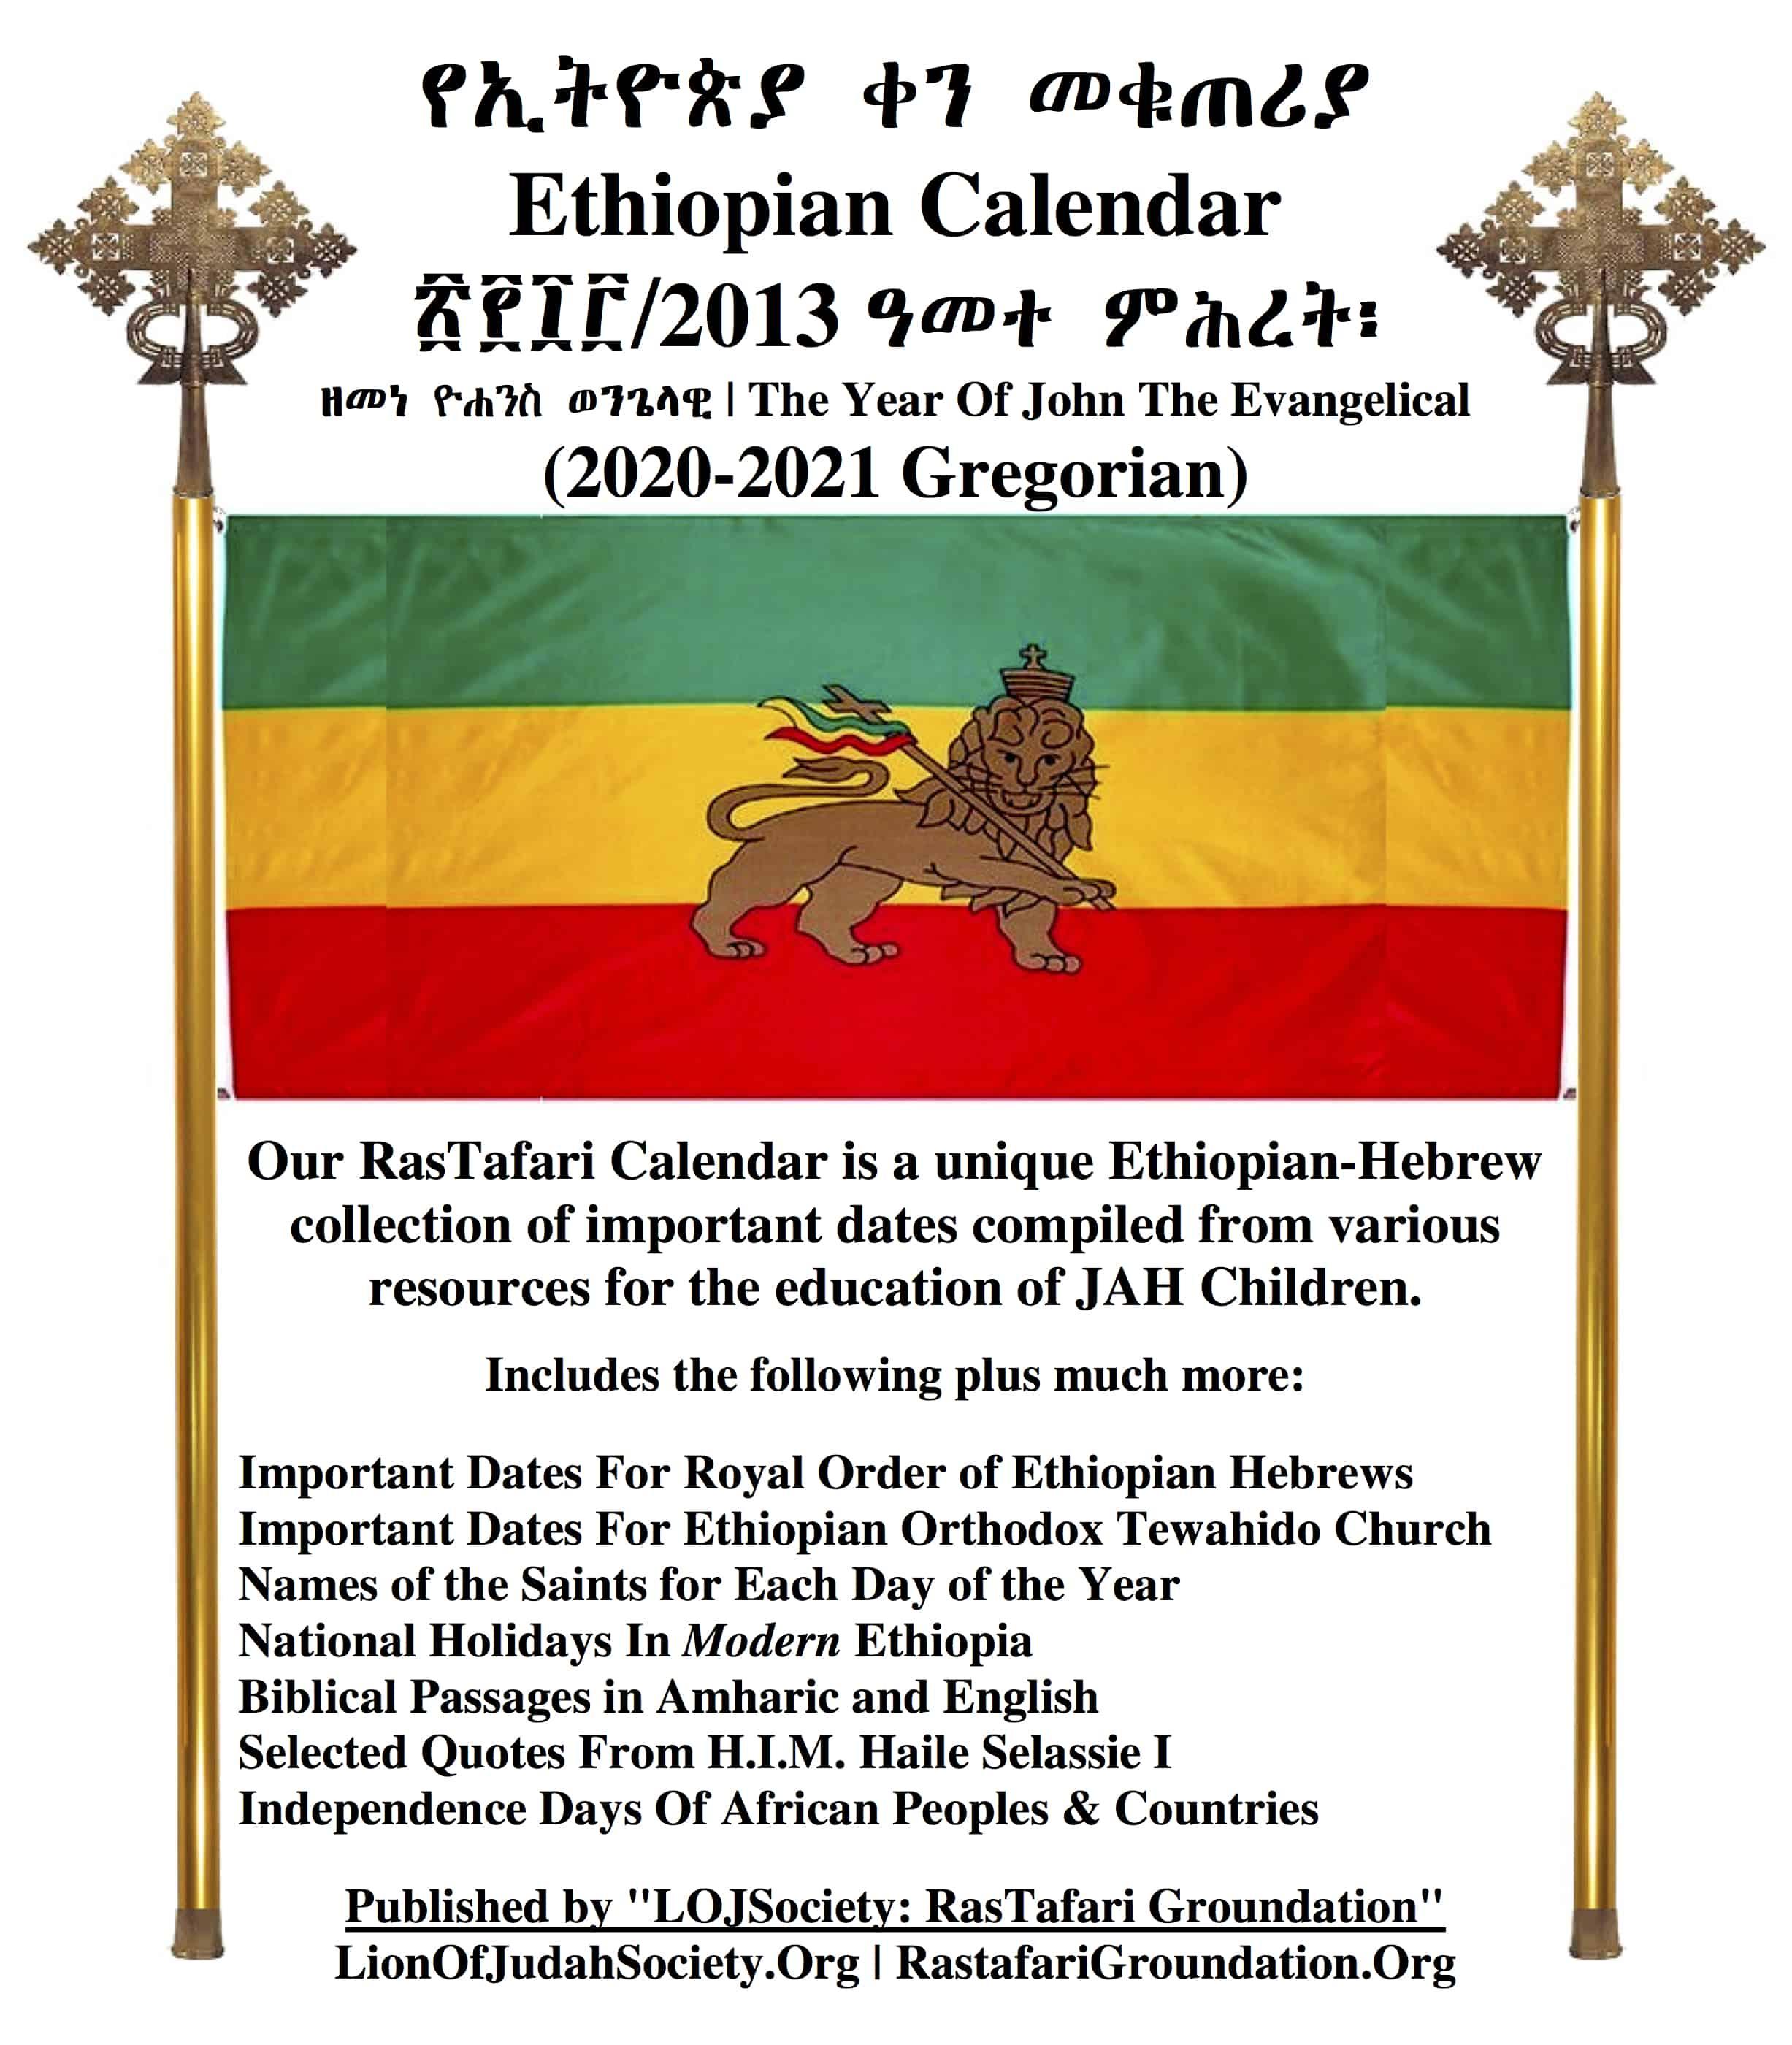 Ethiopian Calendar 2013 – Rastafari Groundation Compilation 2020-2021